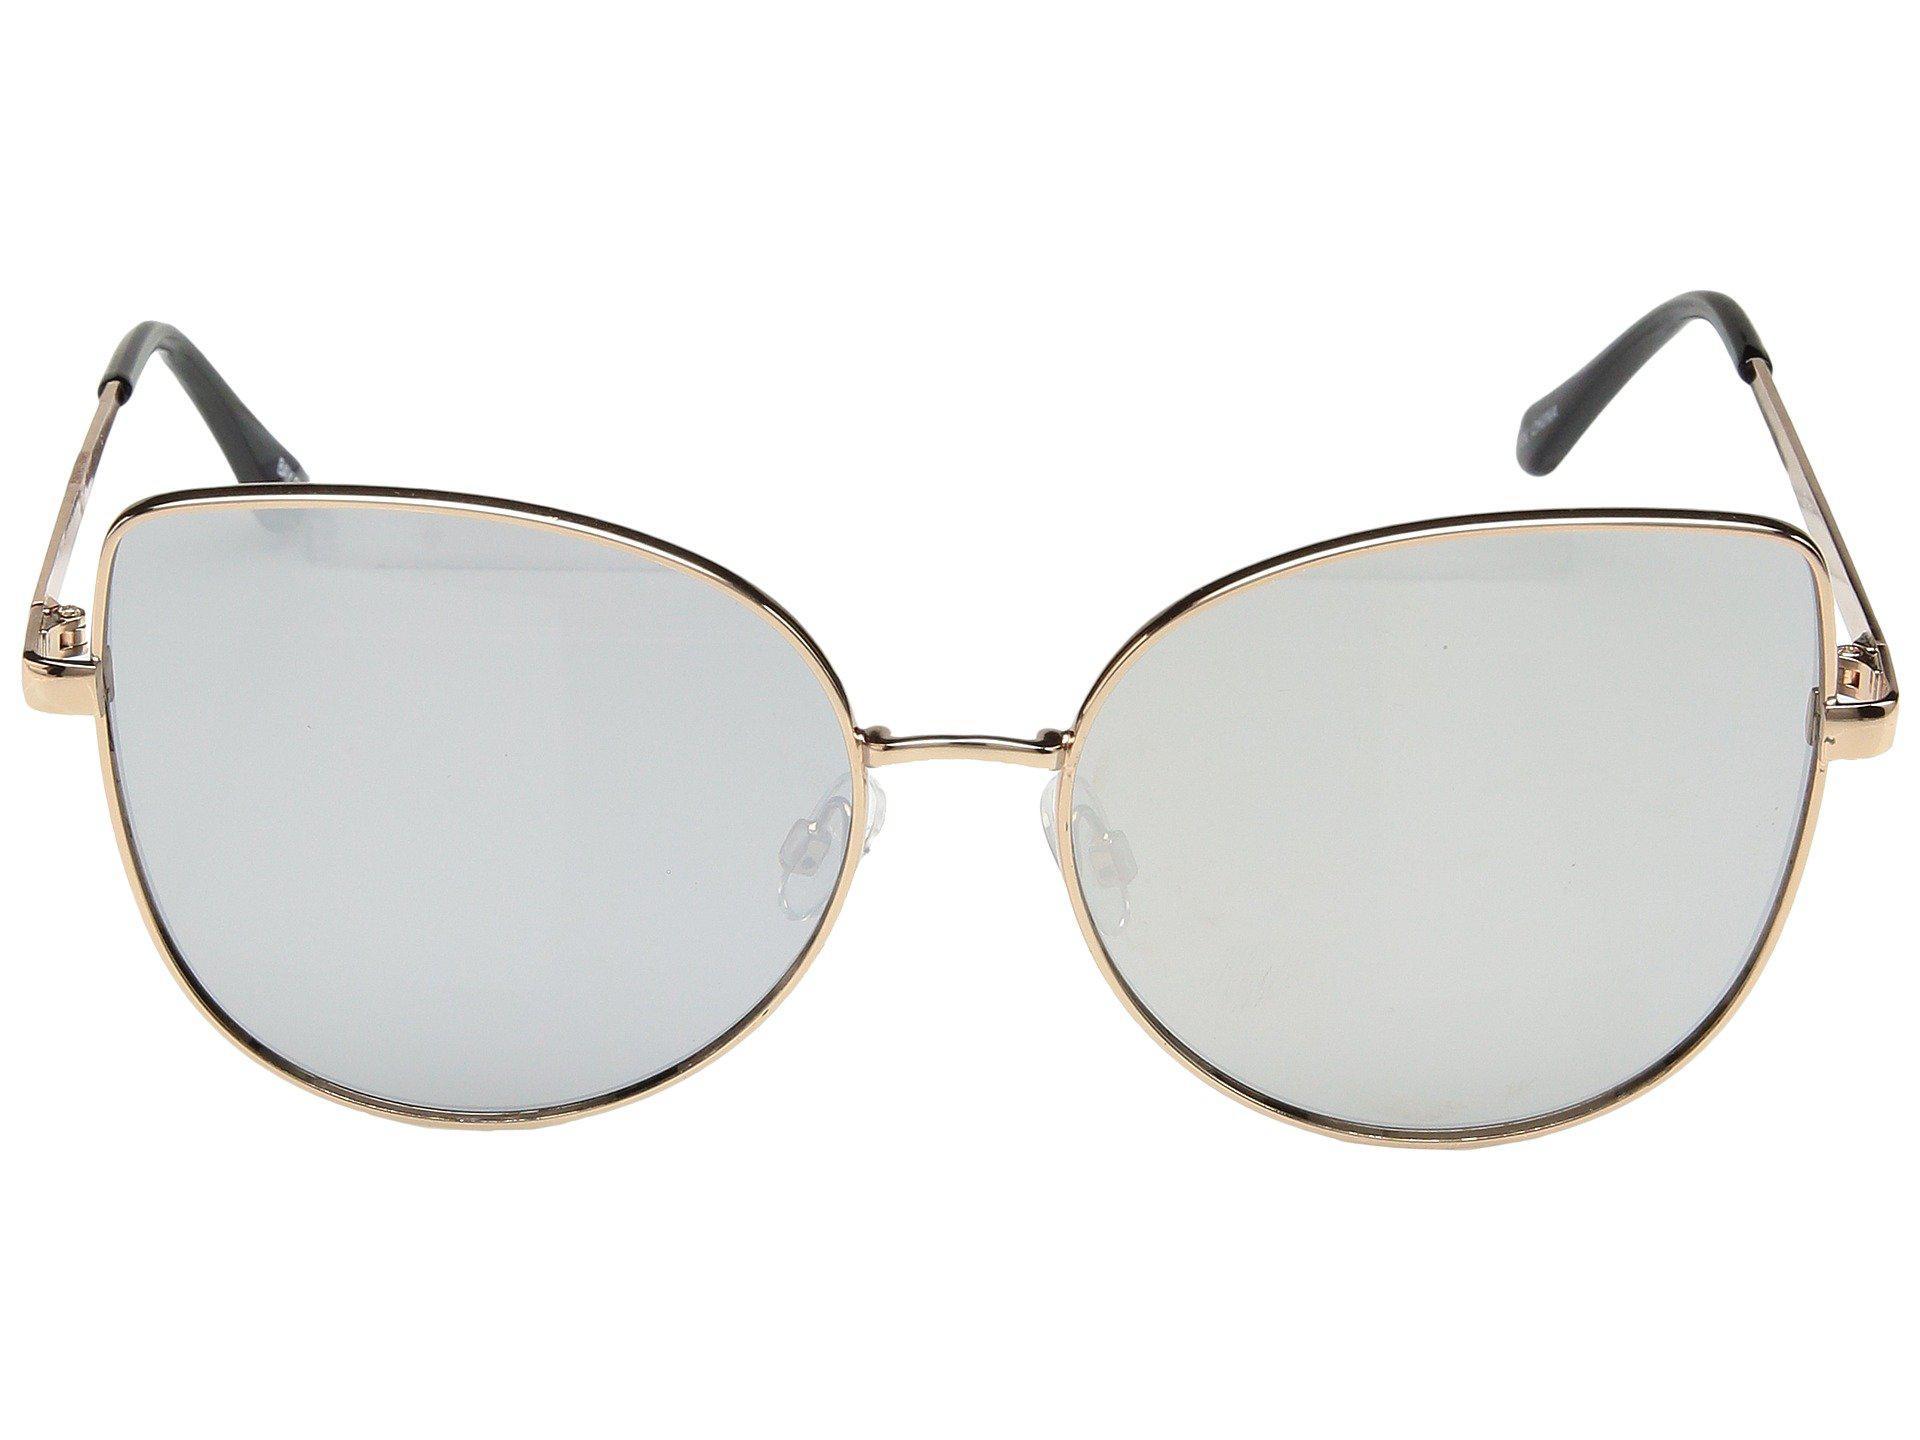 San diego hat company Metal Frame Cat Eyes Sunglasses in Metallic   Lyst